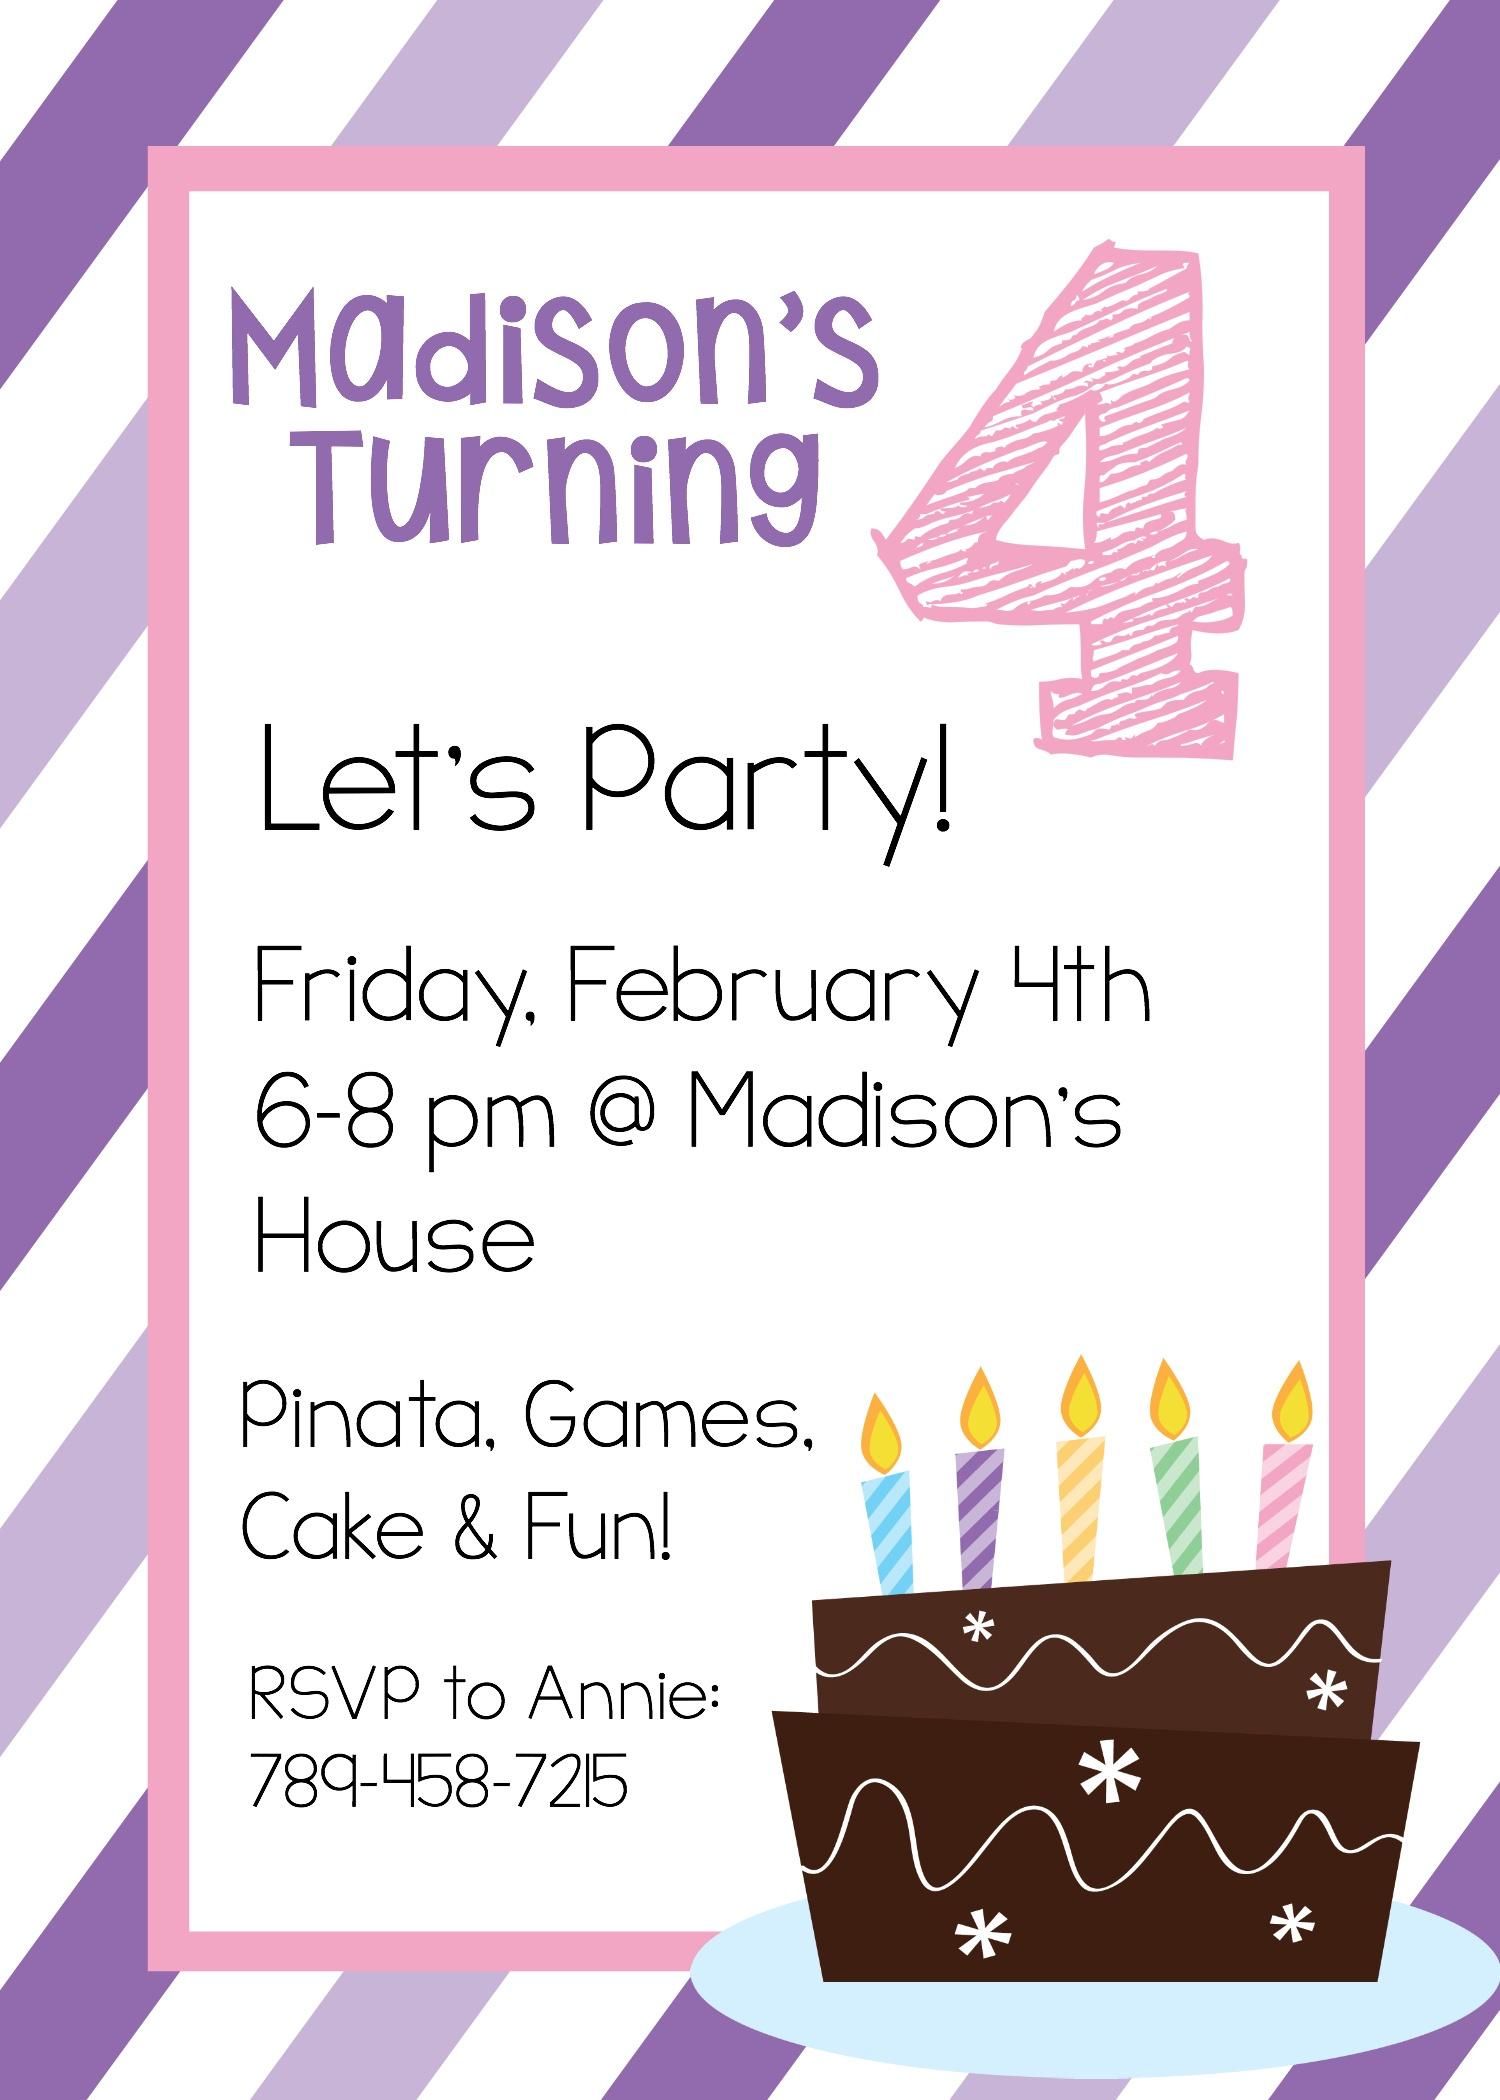 Free Printable Birthday Invitation Templates - Free Printable Invitation Templates